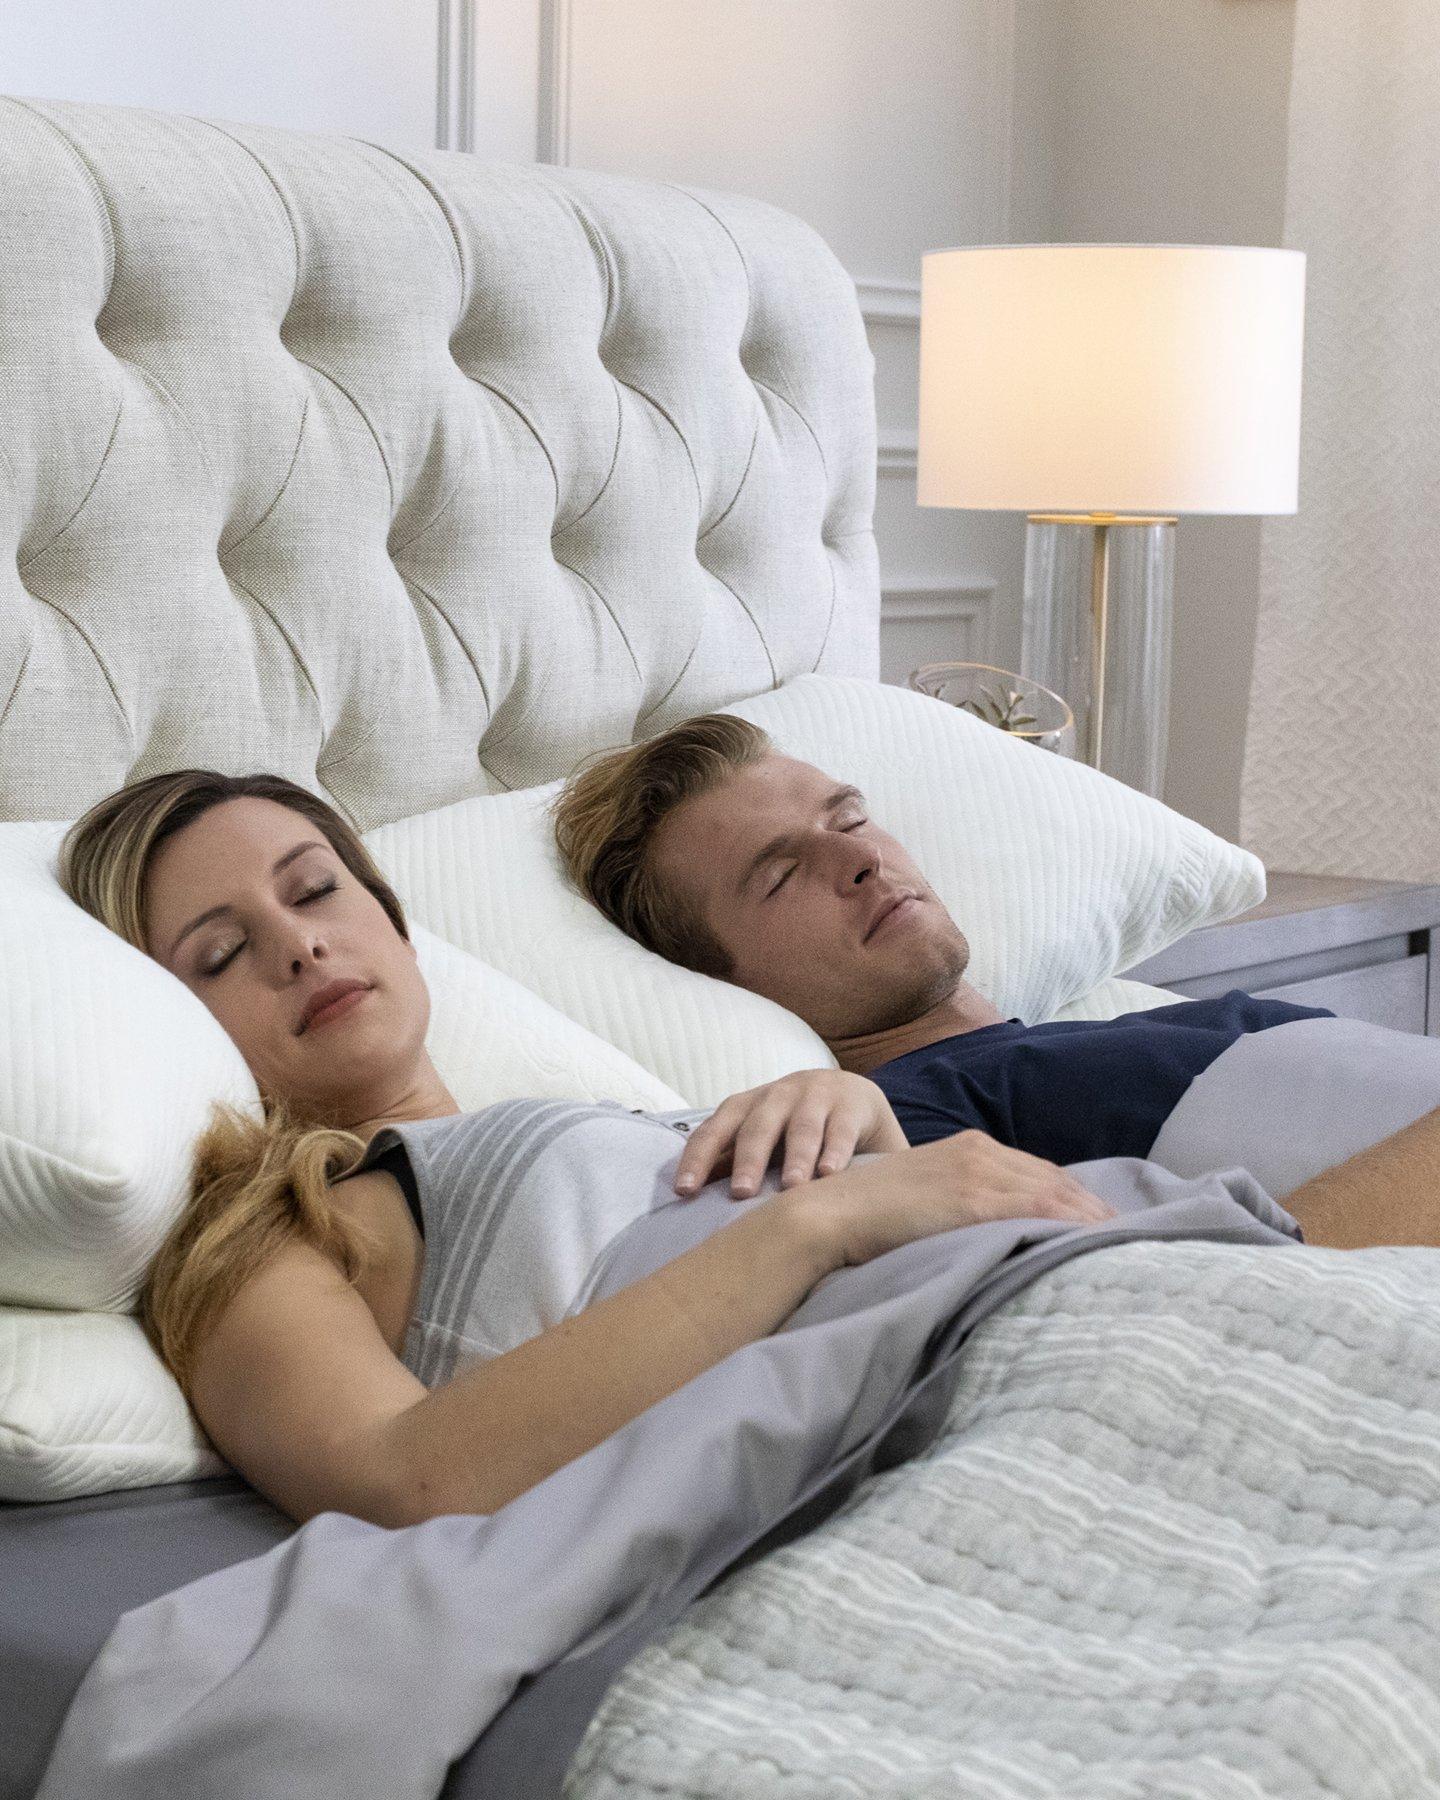 can cbd really help you to go to sleep?